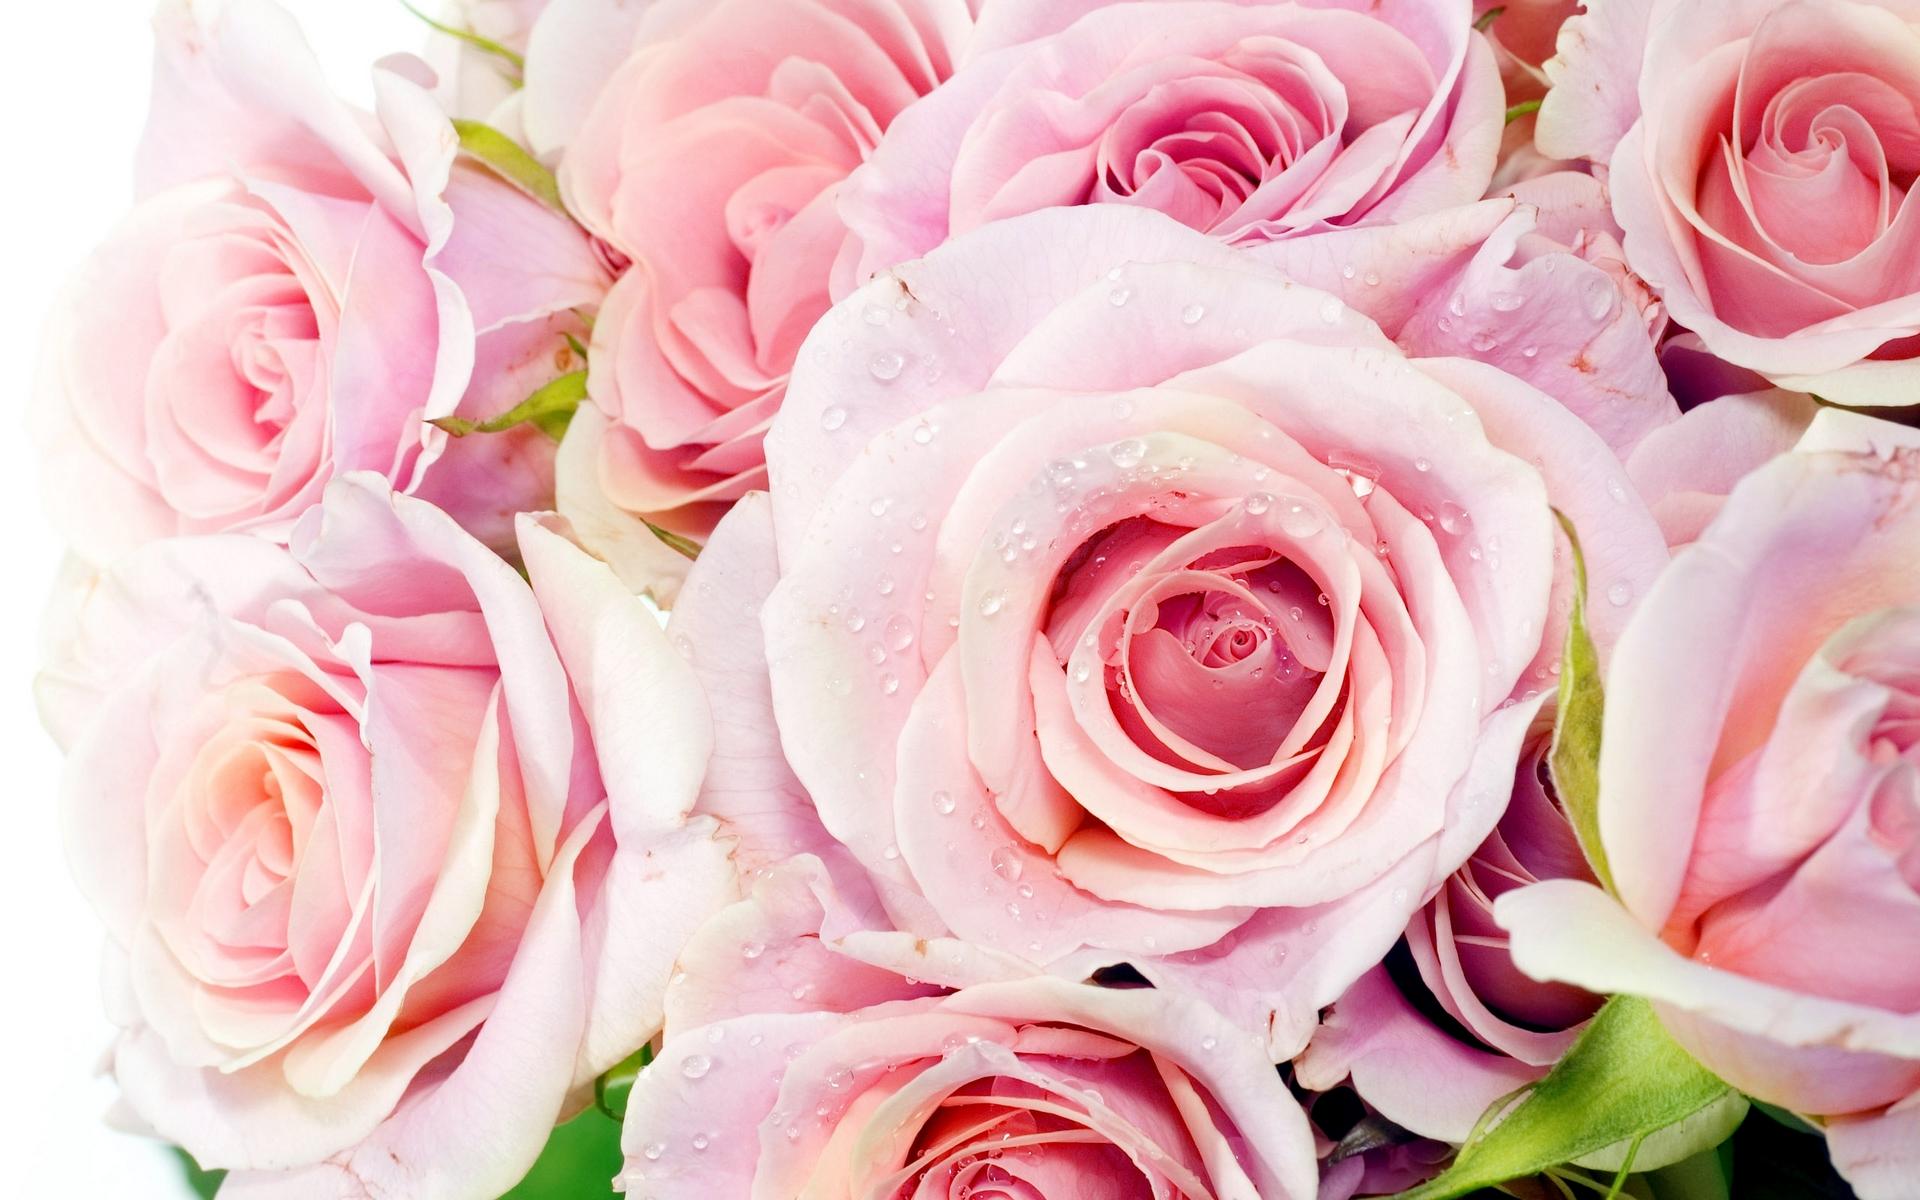 Barbie 3d Live Wallpaper Pink Roses Wallpaper Desktop Hd Desktop Wallpapers 4k Hd